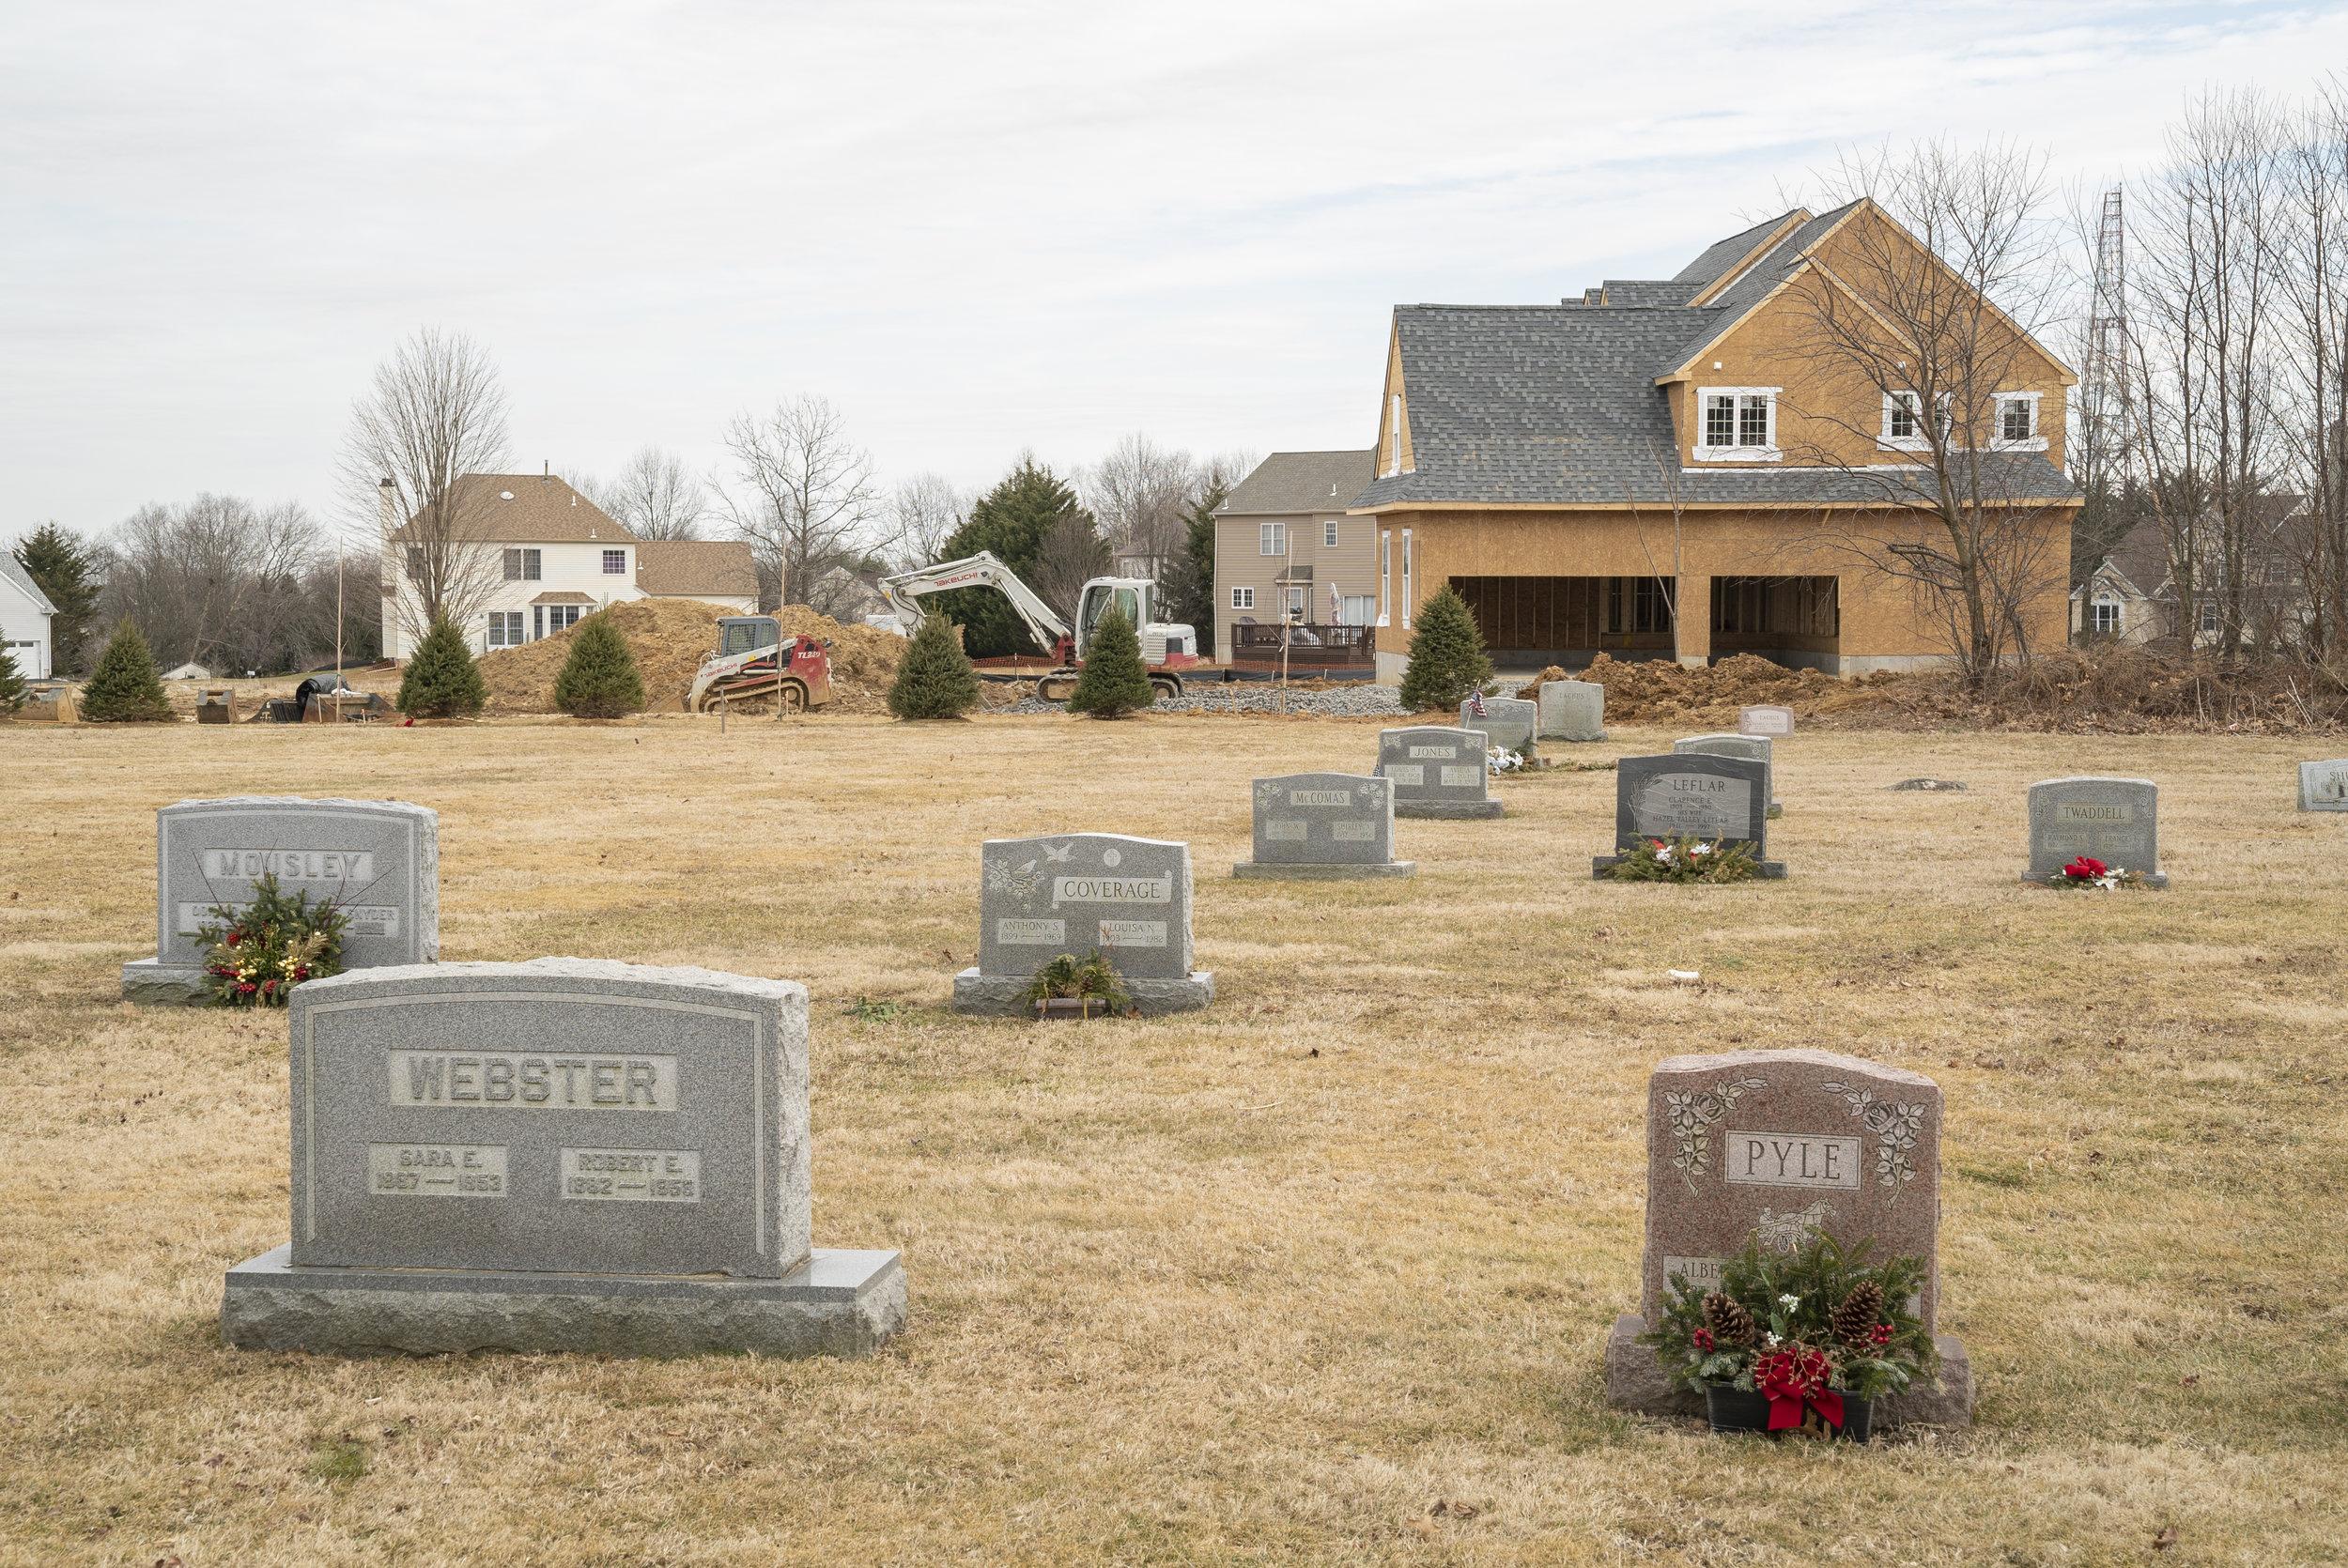 Siloam United Methodist Church Cemetery - Garnet Valley, Pennsylvania. New residential construction. February 27, 2019.